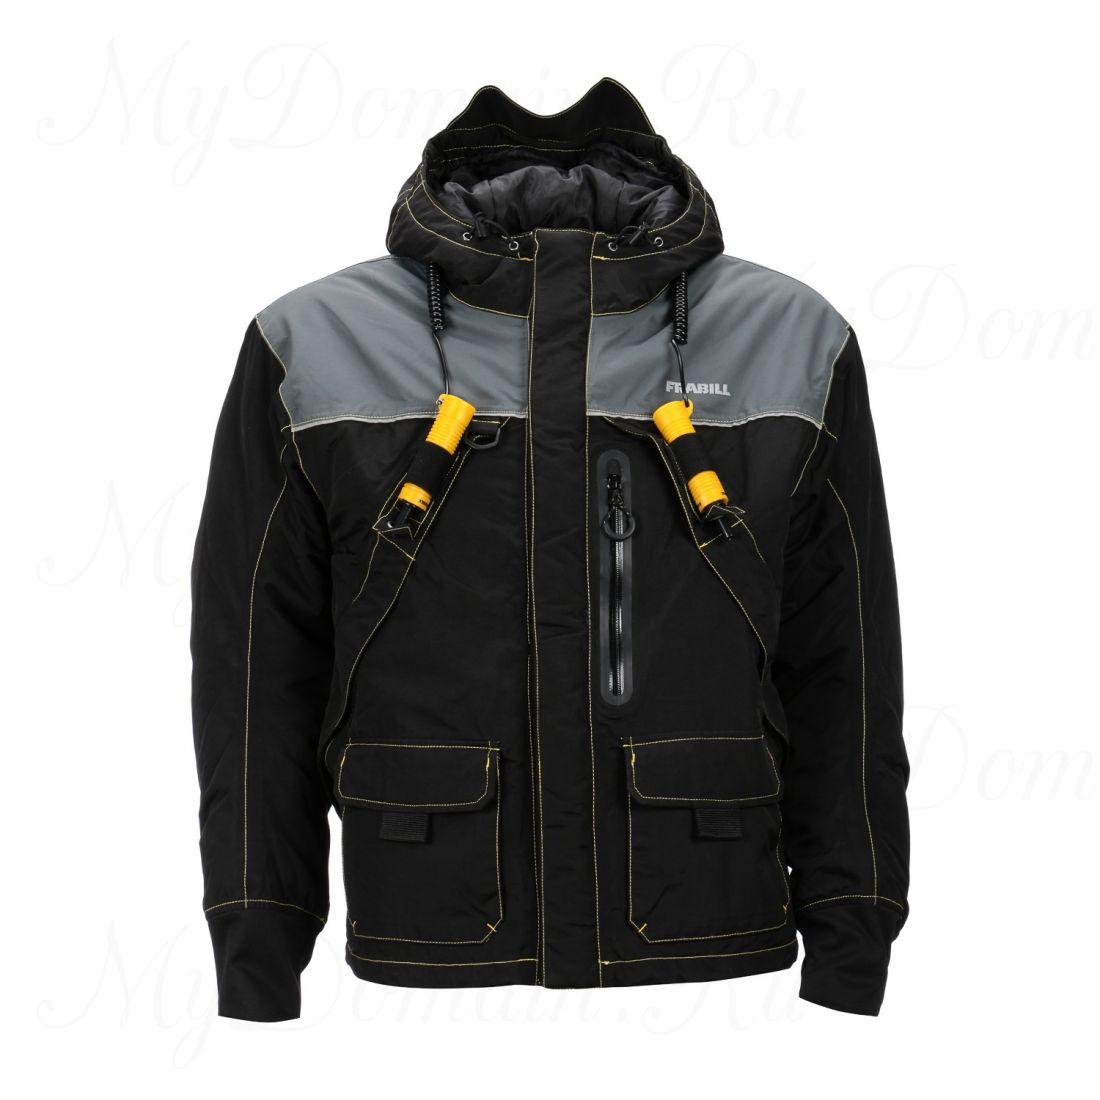 Куртка зимняя Frabill I3 Jacket, Black размер 3XL